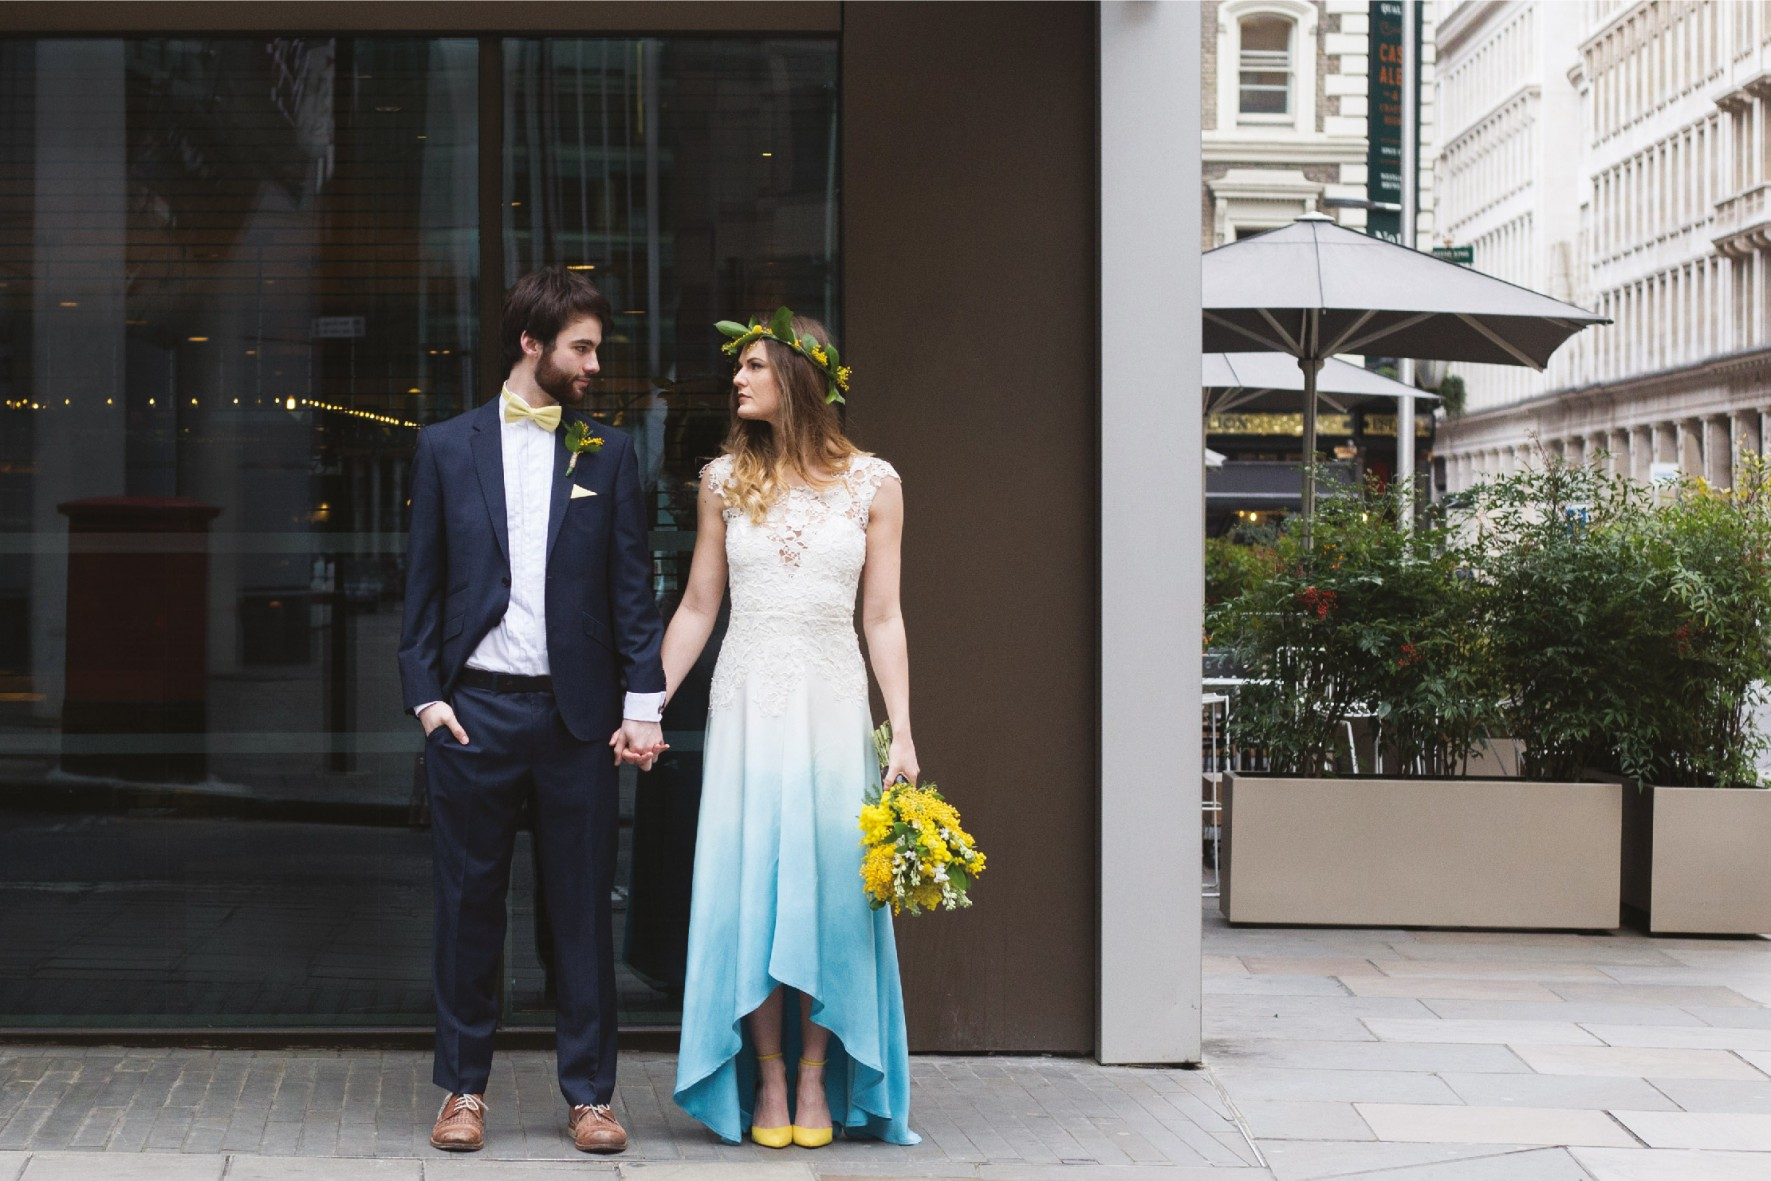 Modern wedding photography - London by www.rosepaperscissors.com